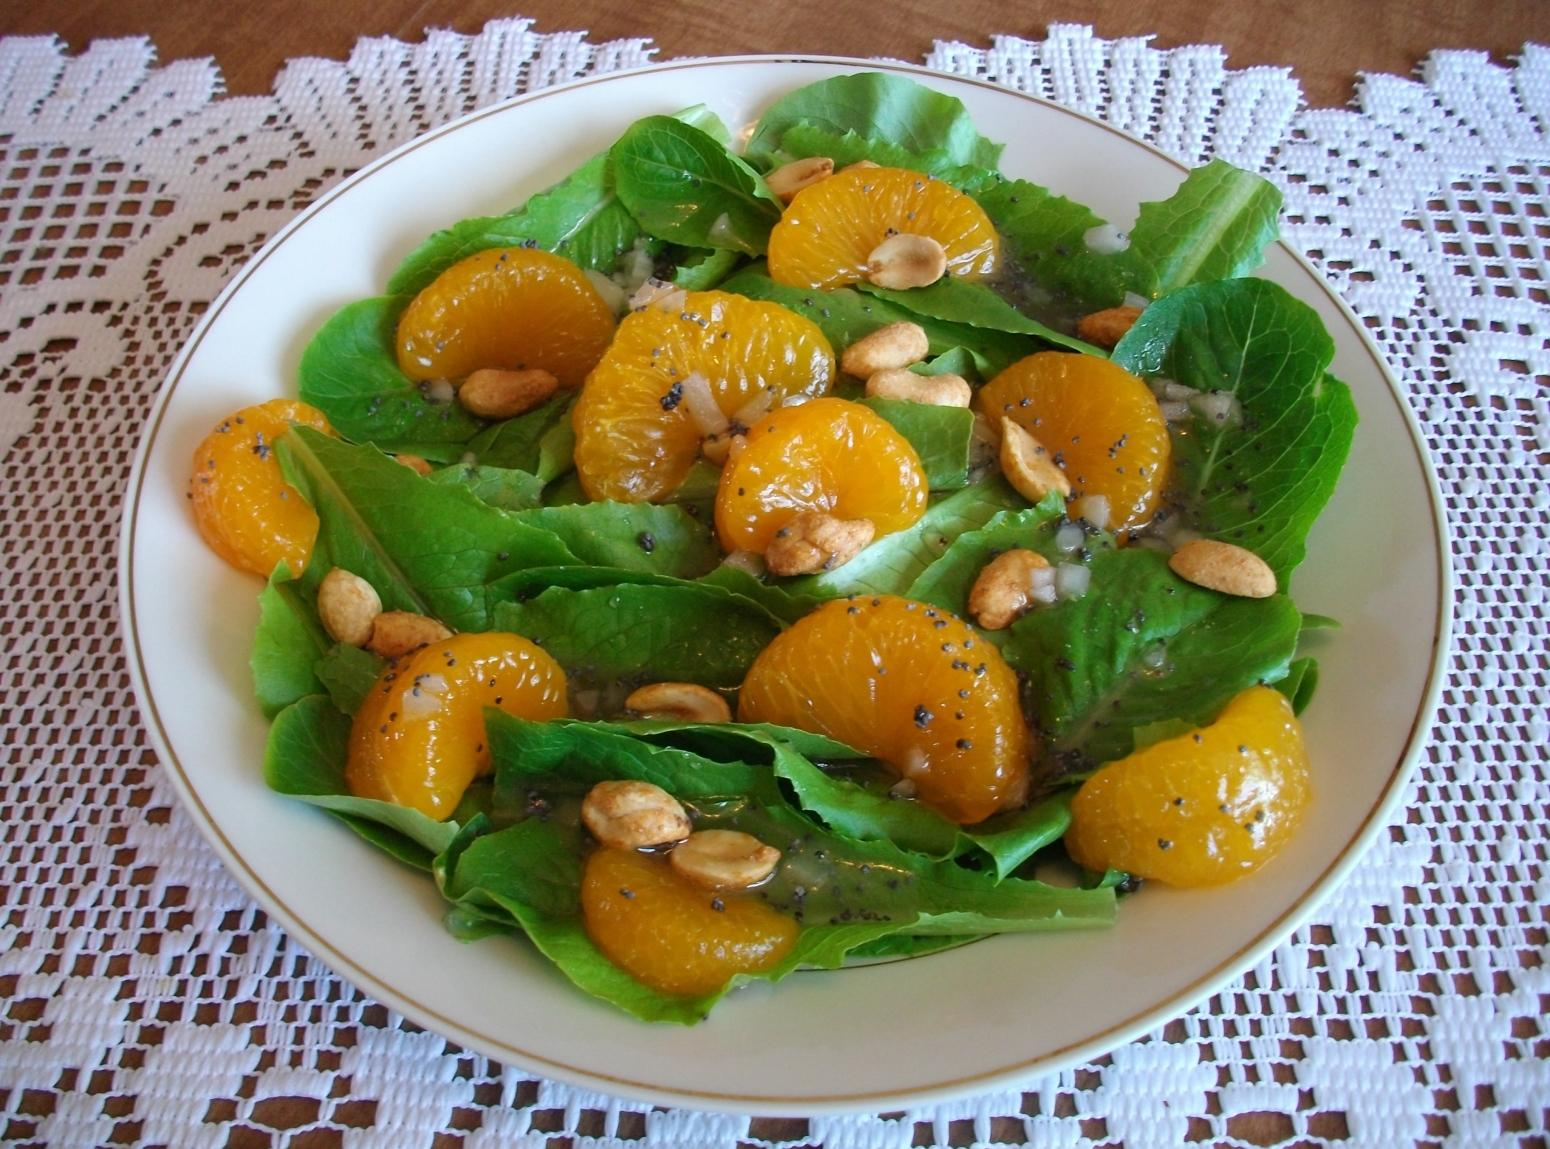 Mandarin Orange Salad With Peanuts Recipe | Just A Pinch ...